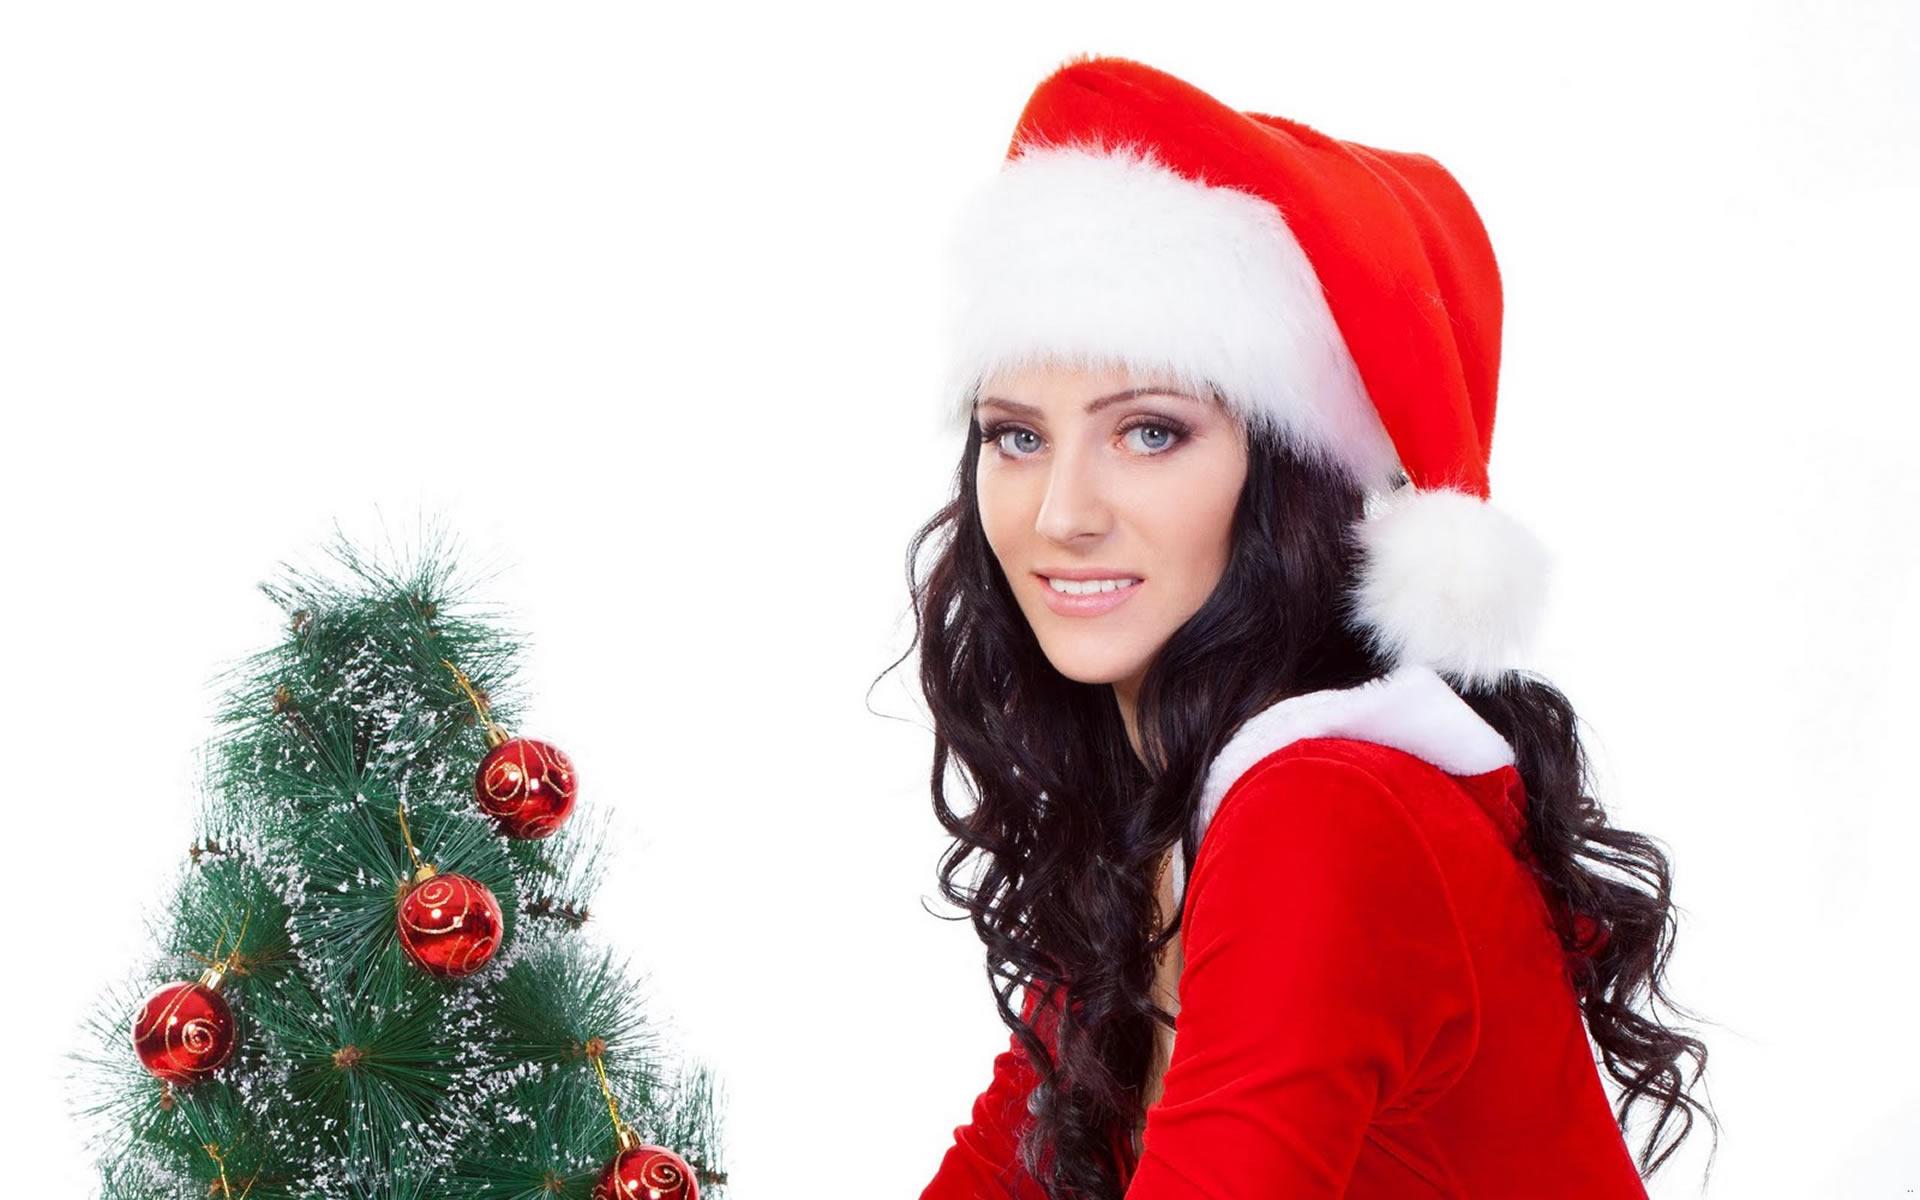 Wallpaper Chica Santa Claus decorando árbol